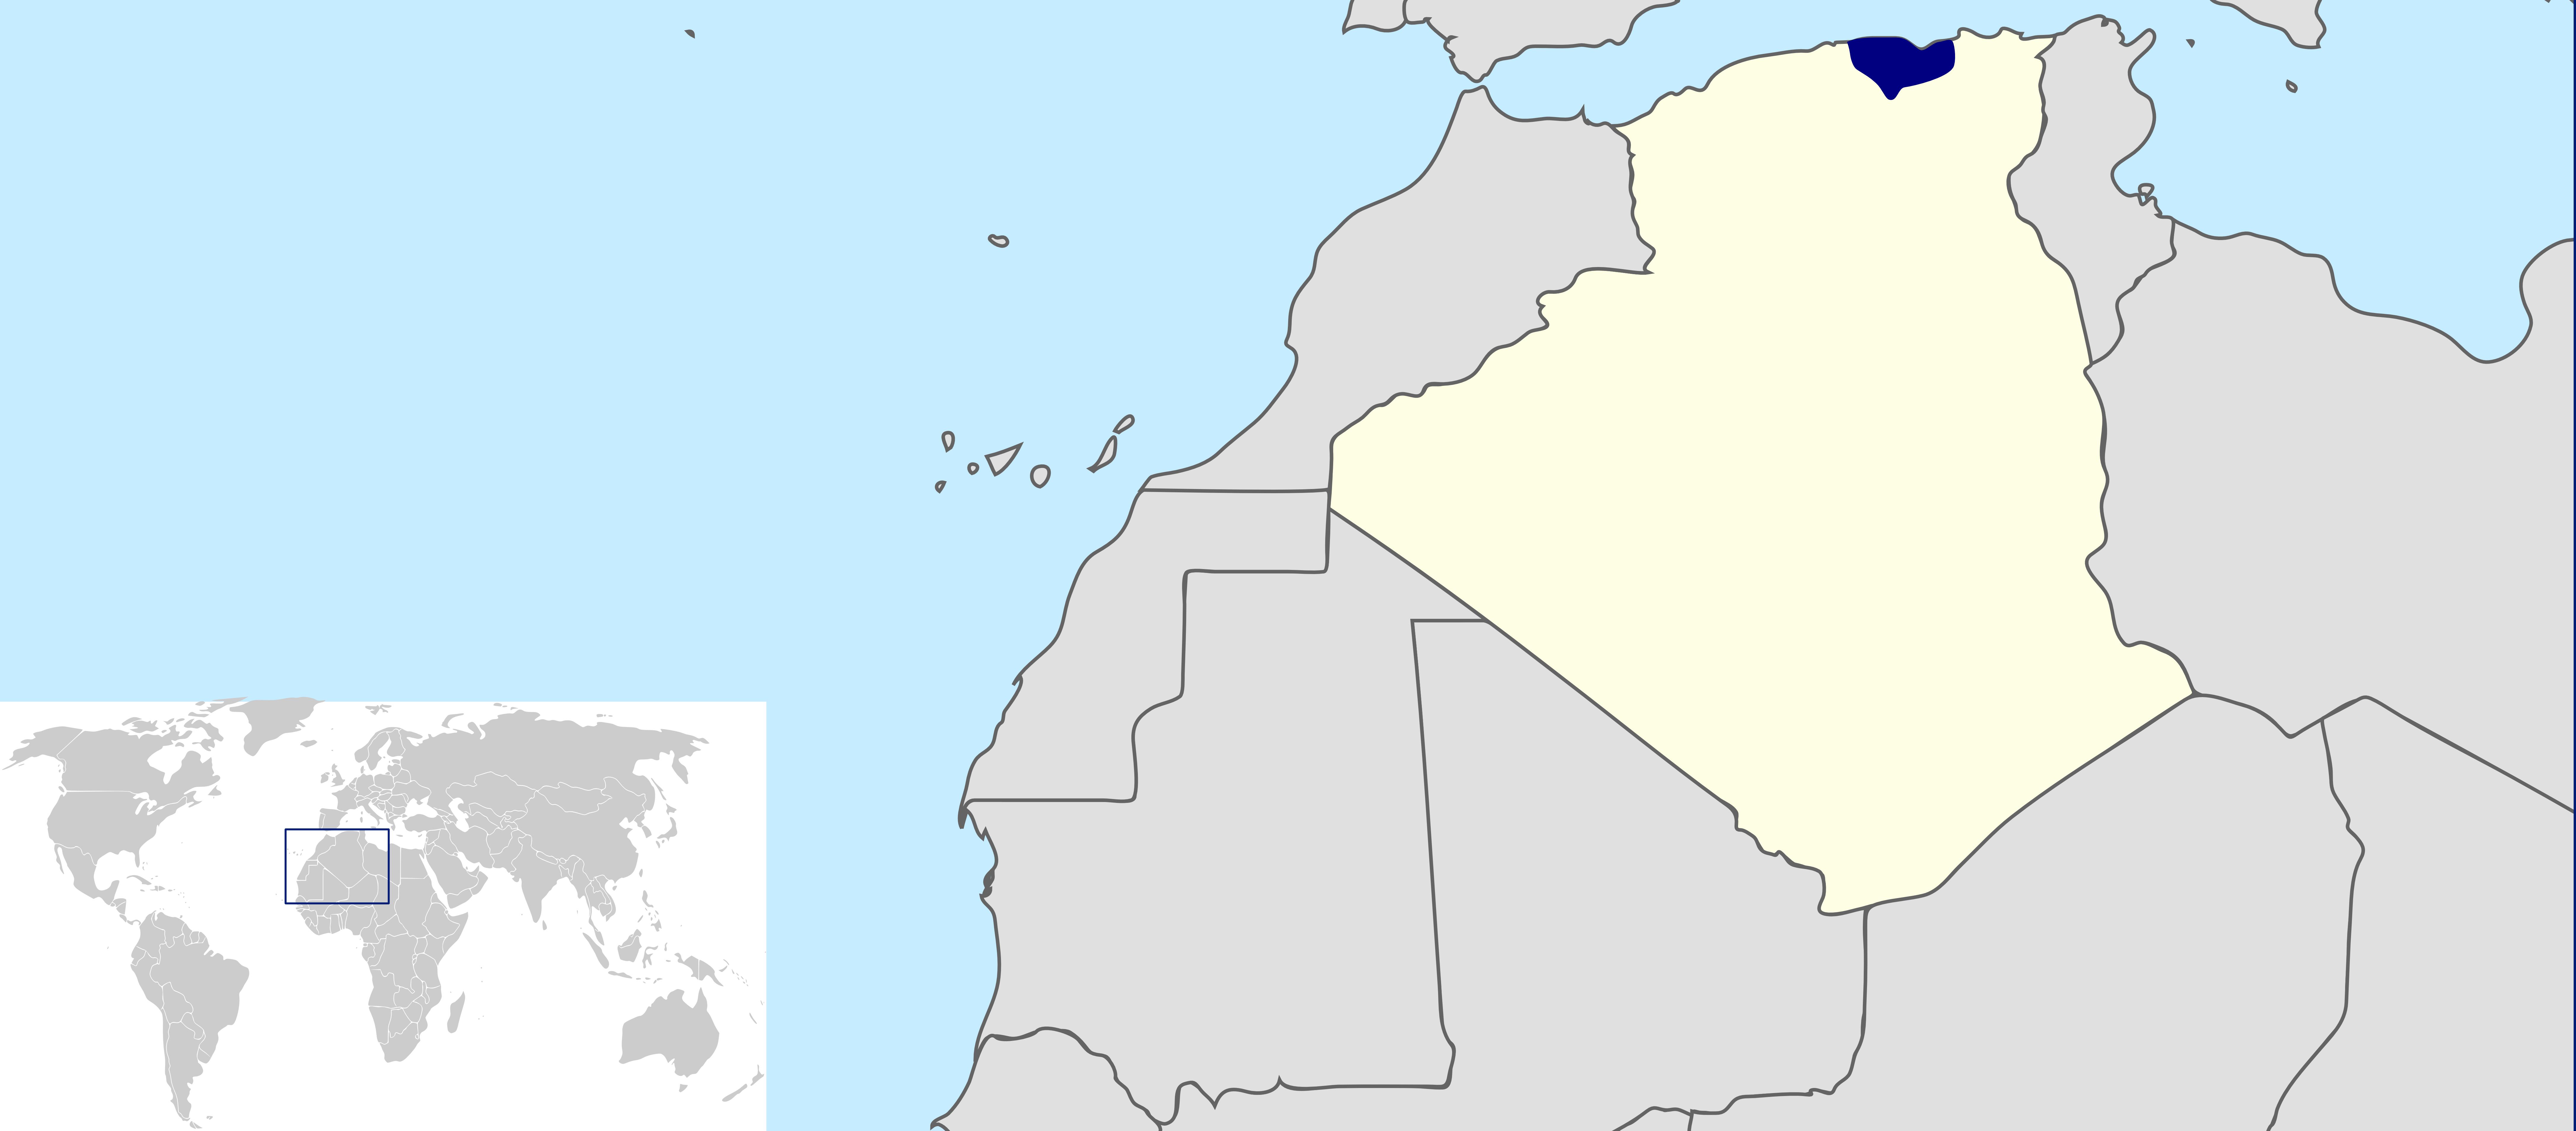 dd9be0b44 منطقة القبائل - ويكيبيديا، الموسوعة الحرة